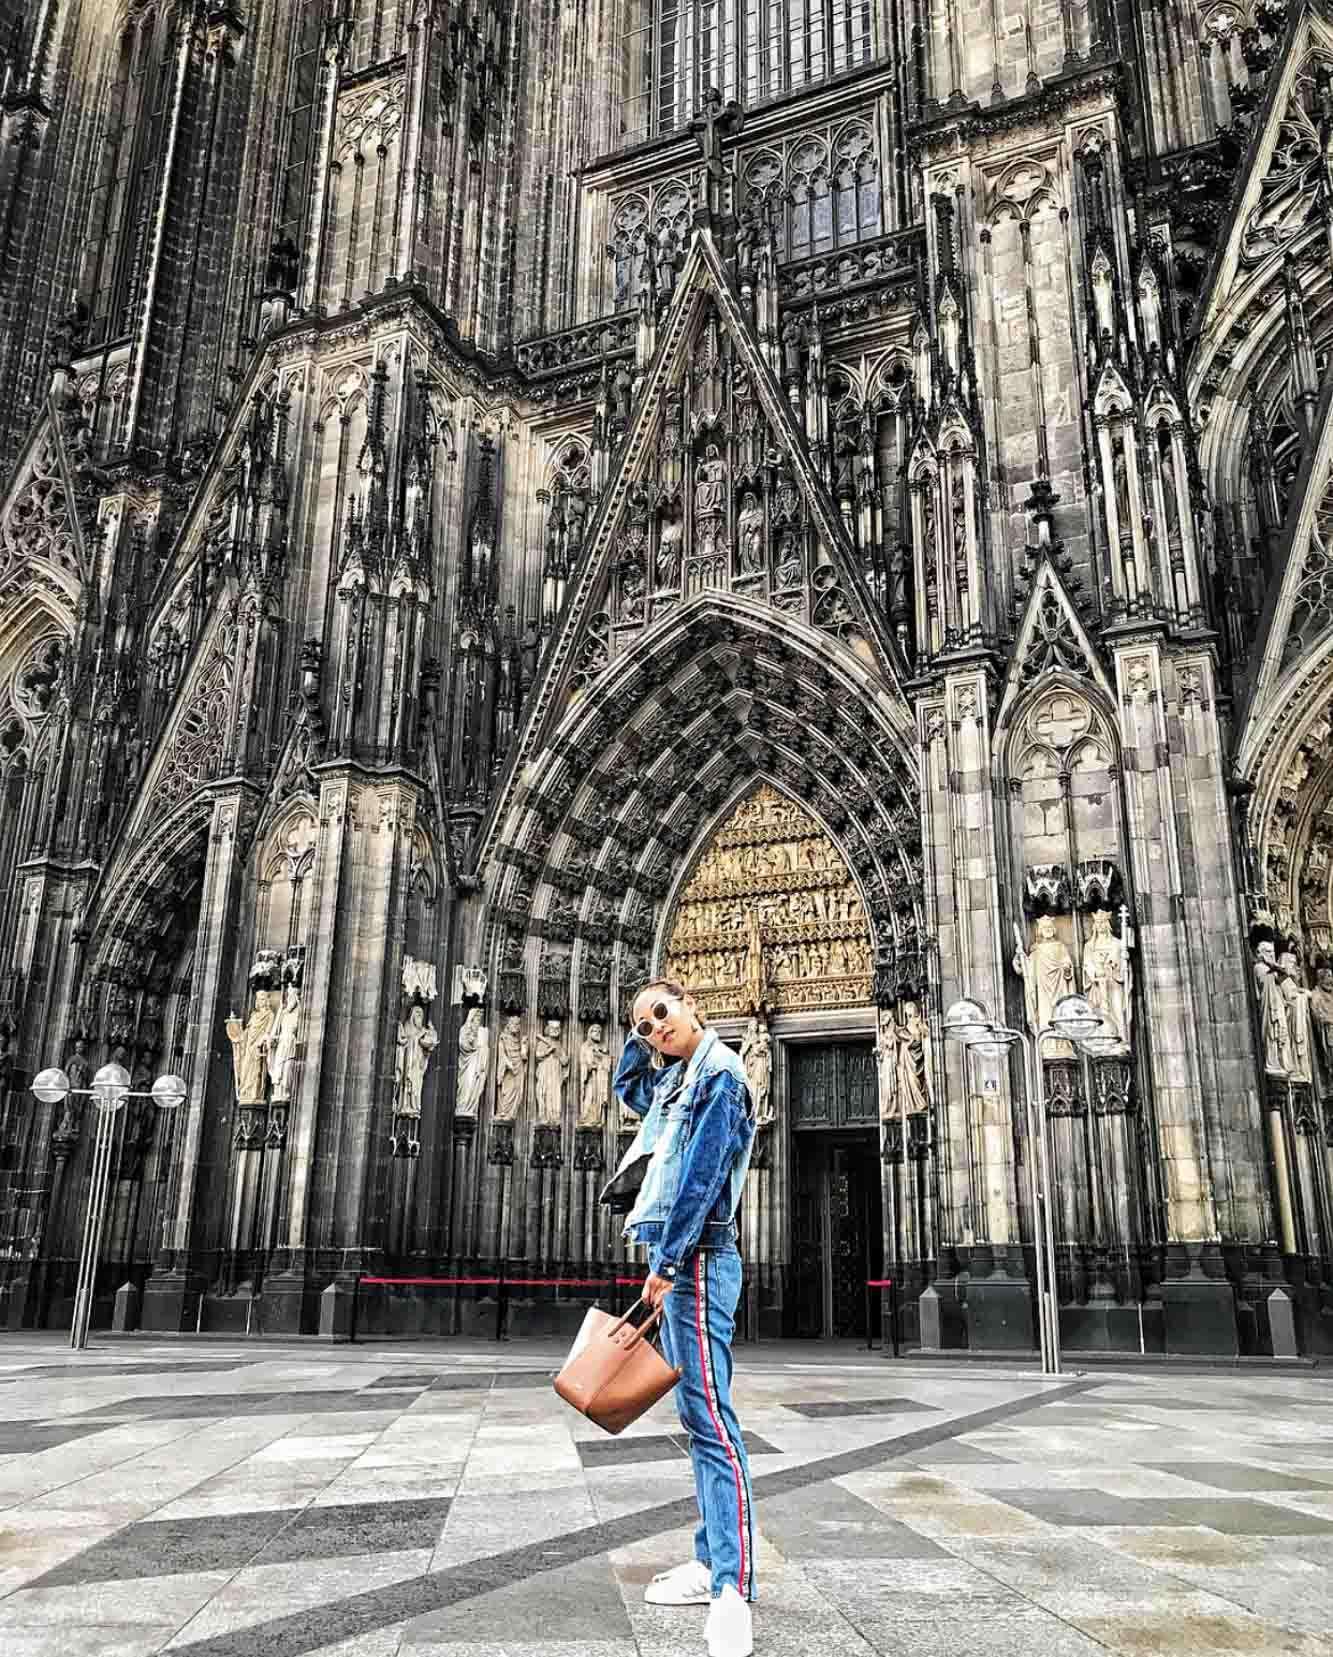 U by Uniworld, Cologne Germany